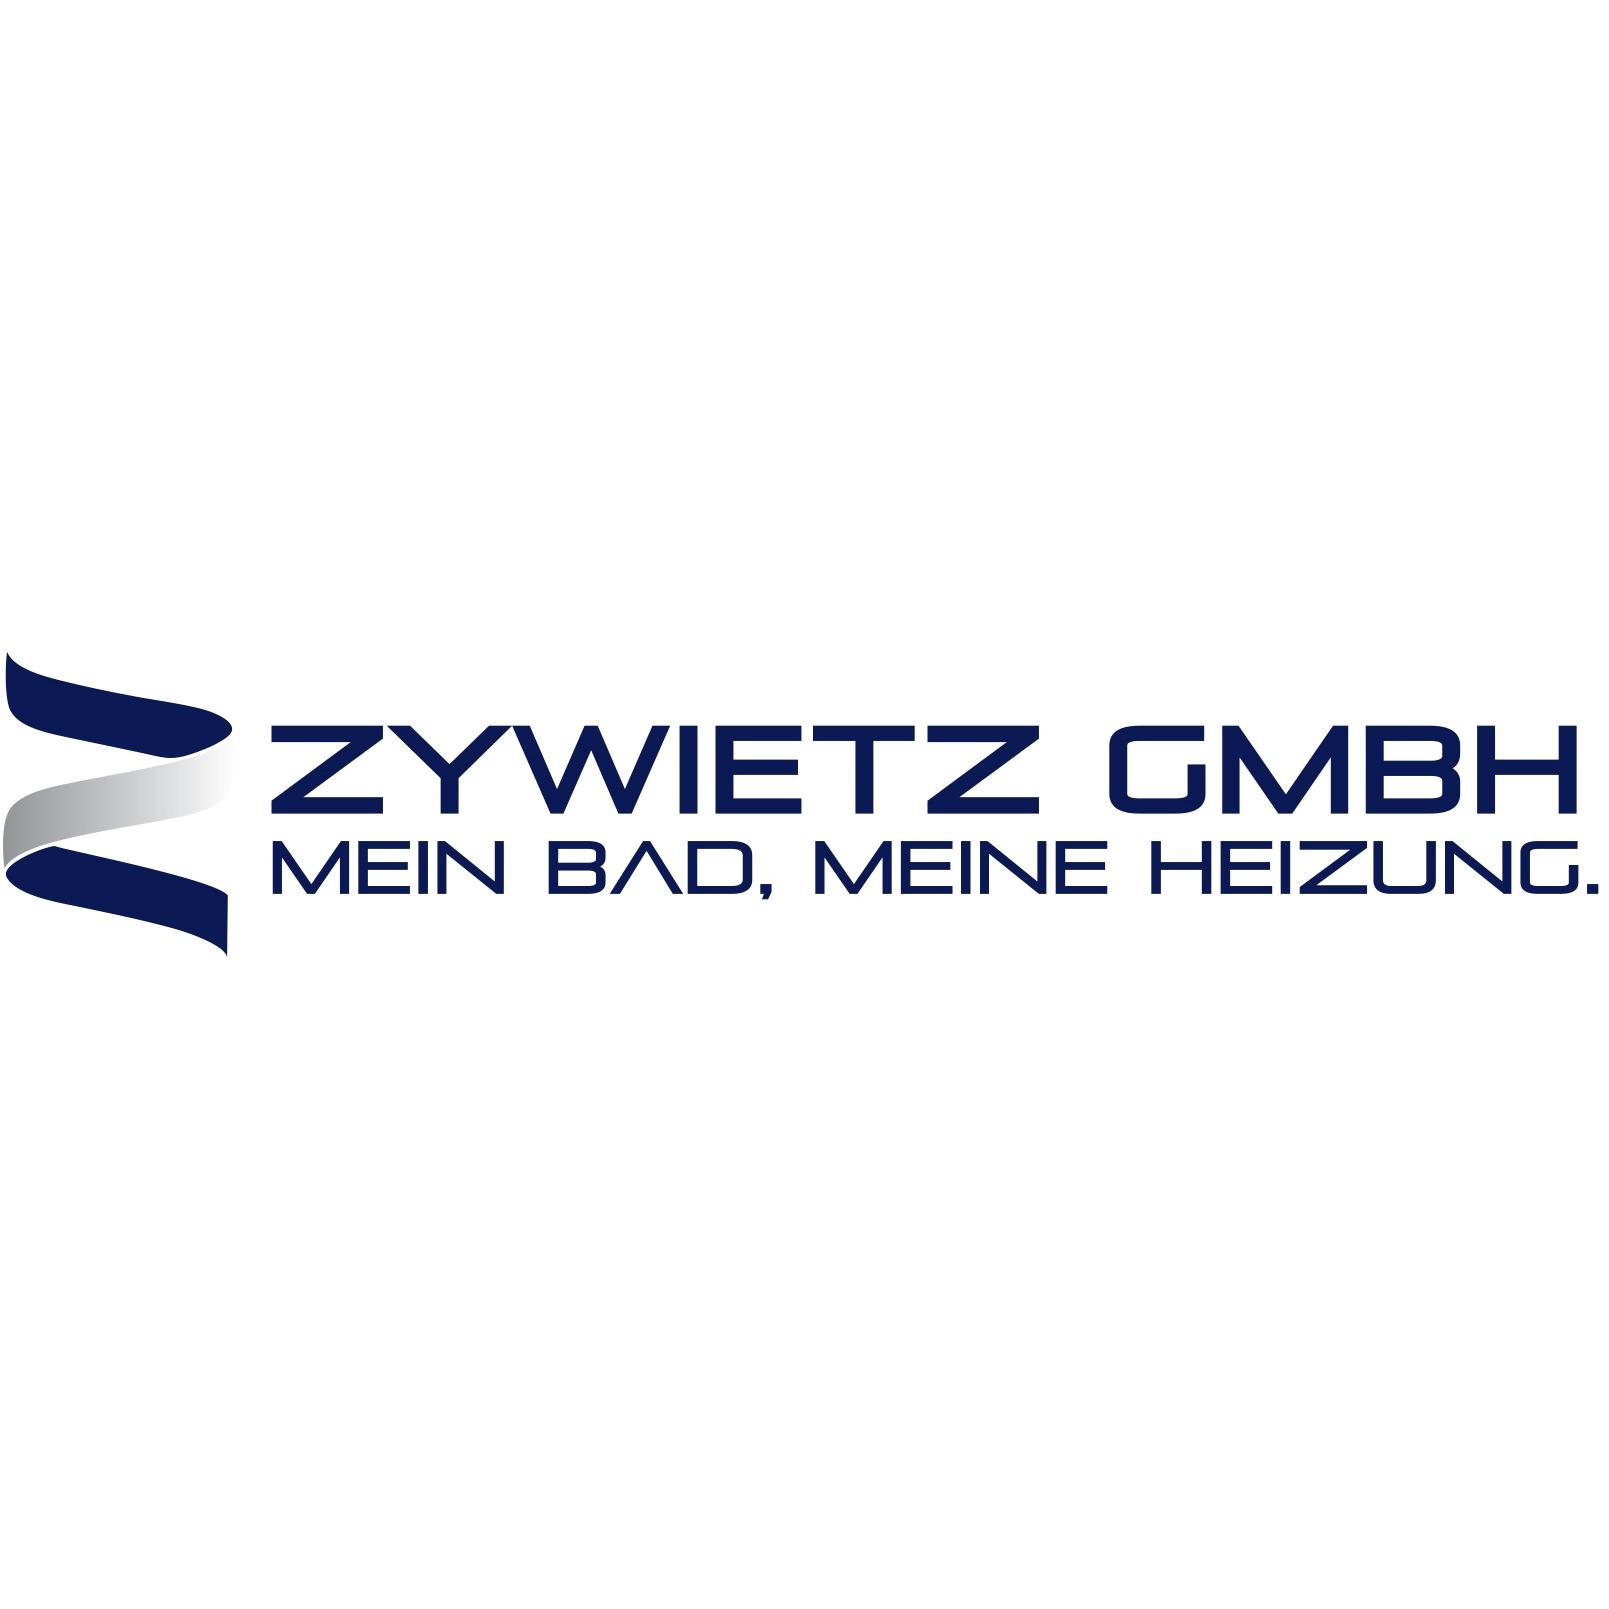 Bild zu Zywietz GmbH in Bochum